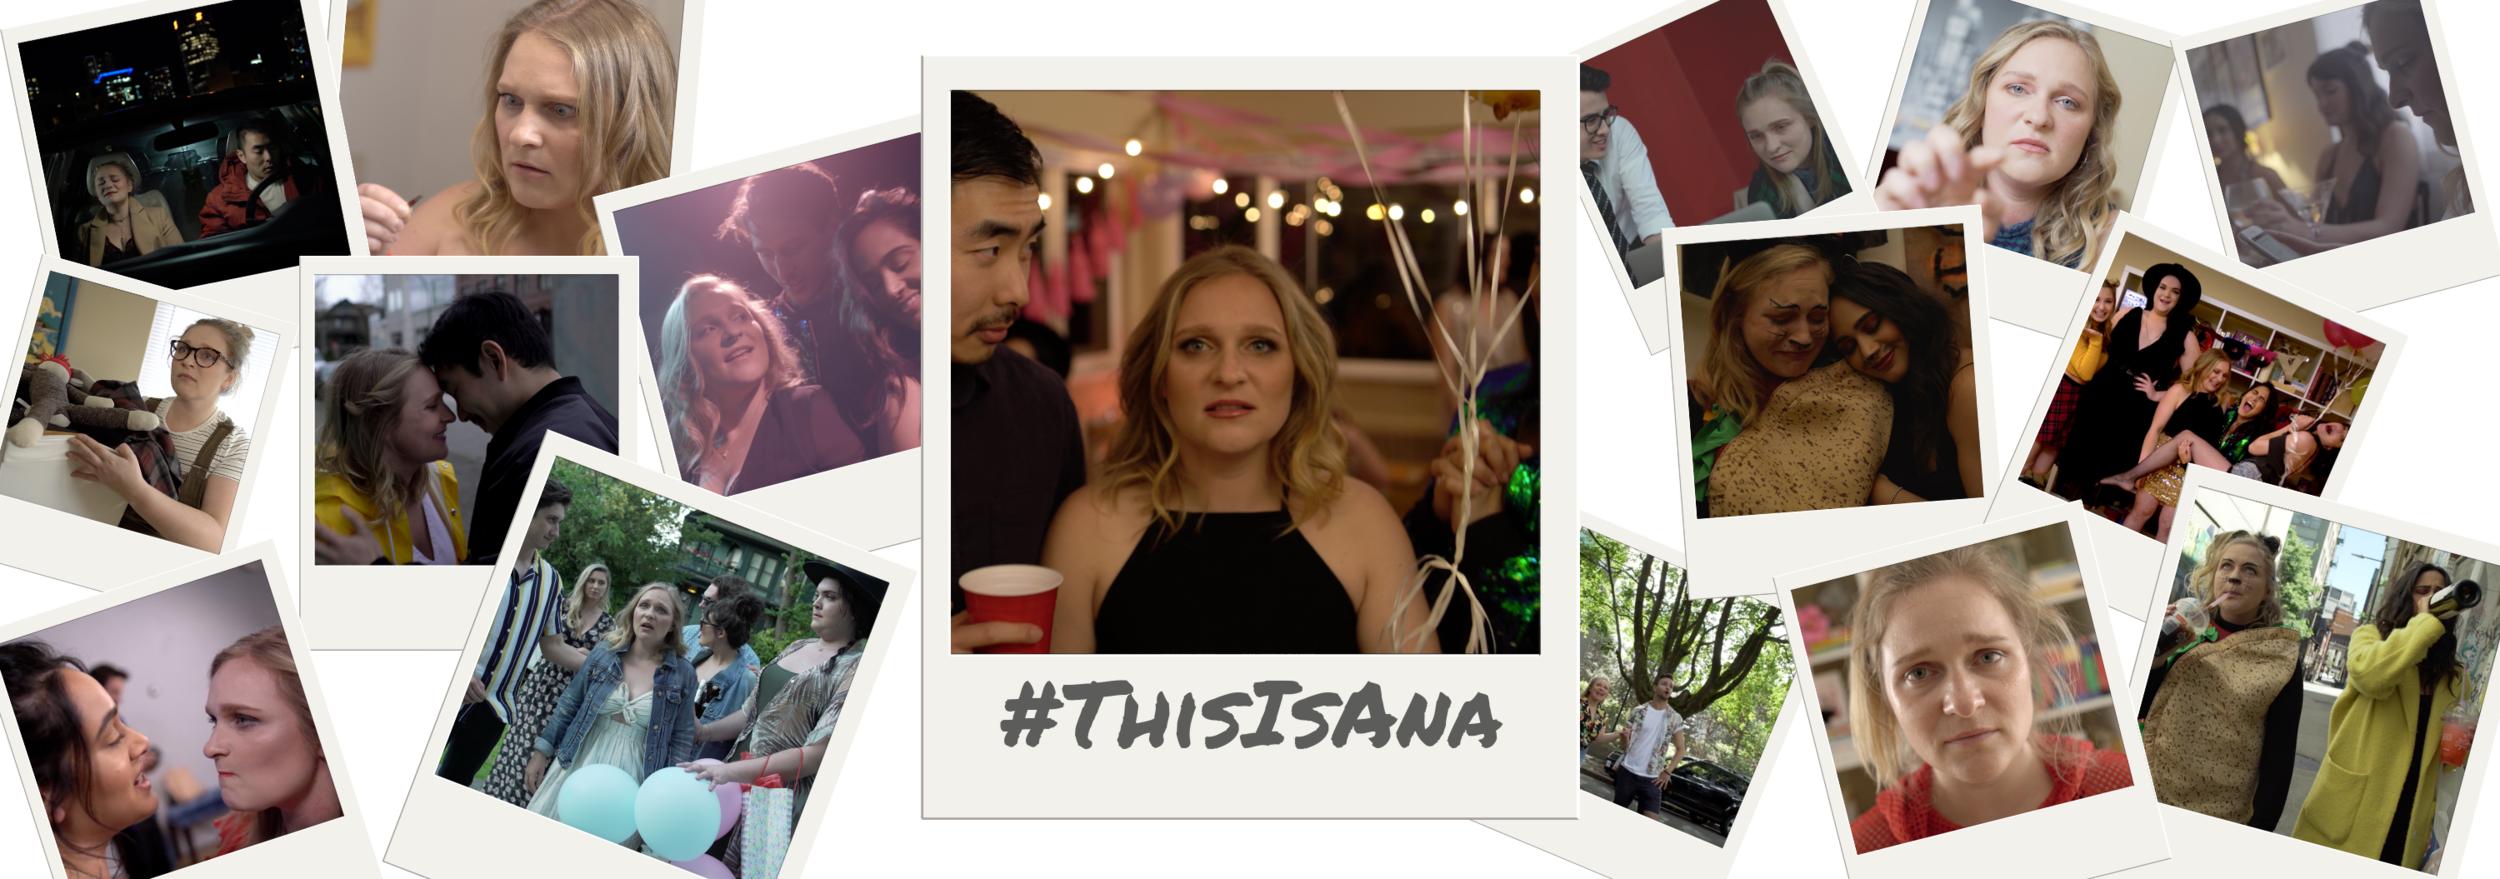 #ThisIsAna (2).png